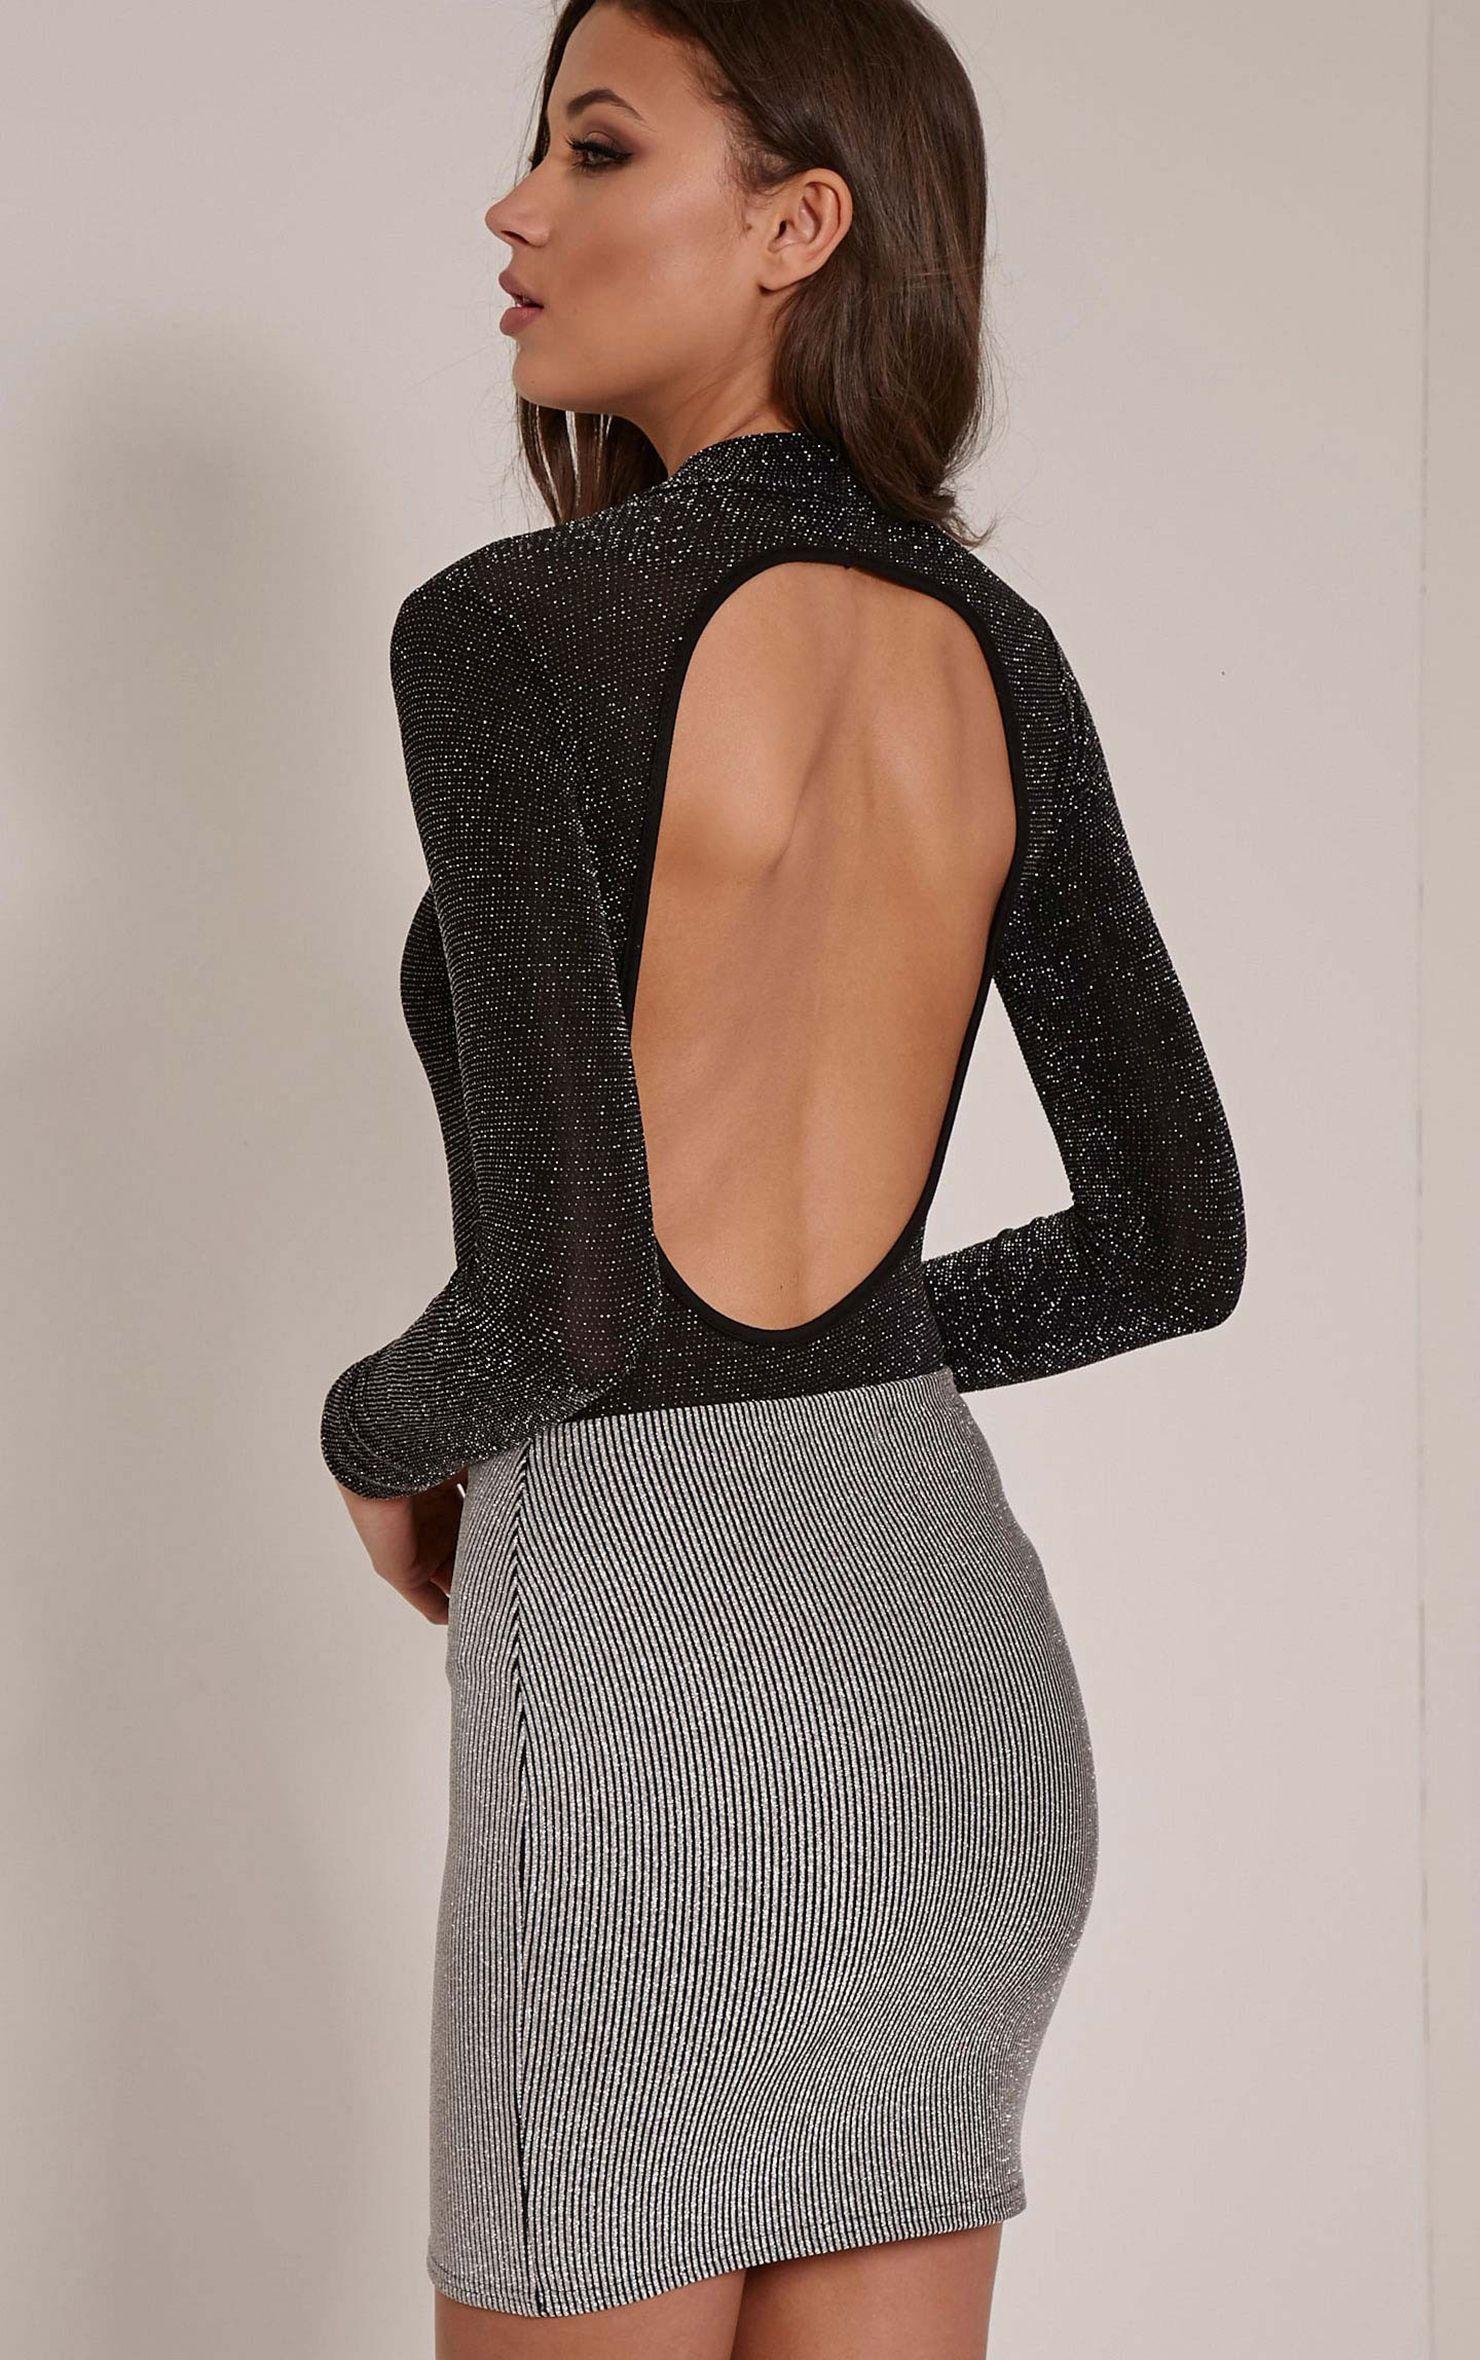 Jane Silver Glitter Cut Out Back Bodysuit 1